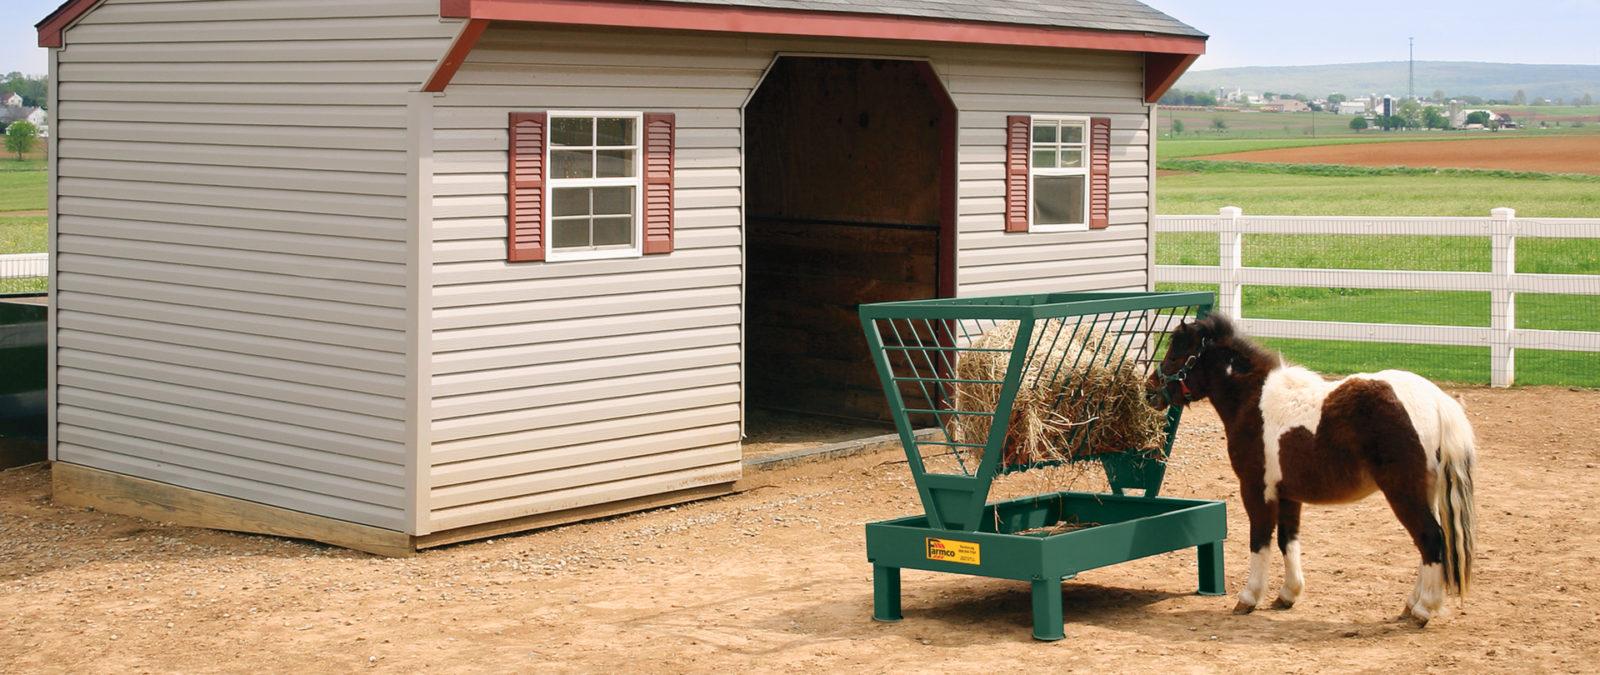 A horse hay feeder